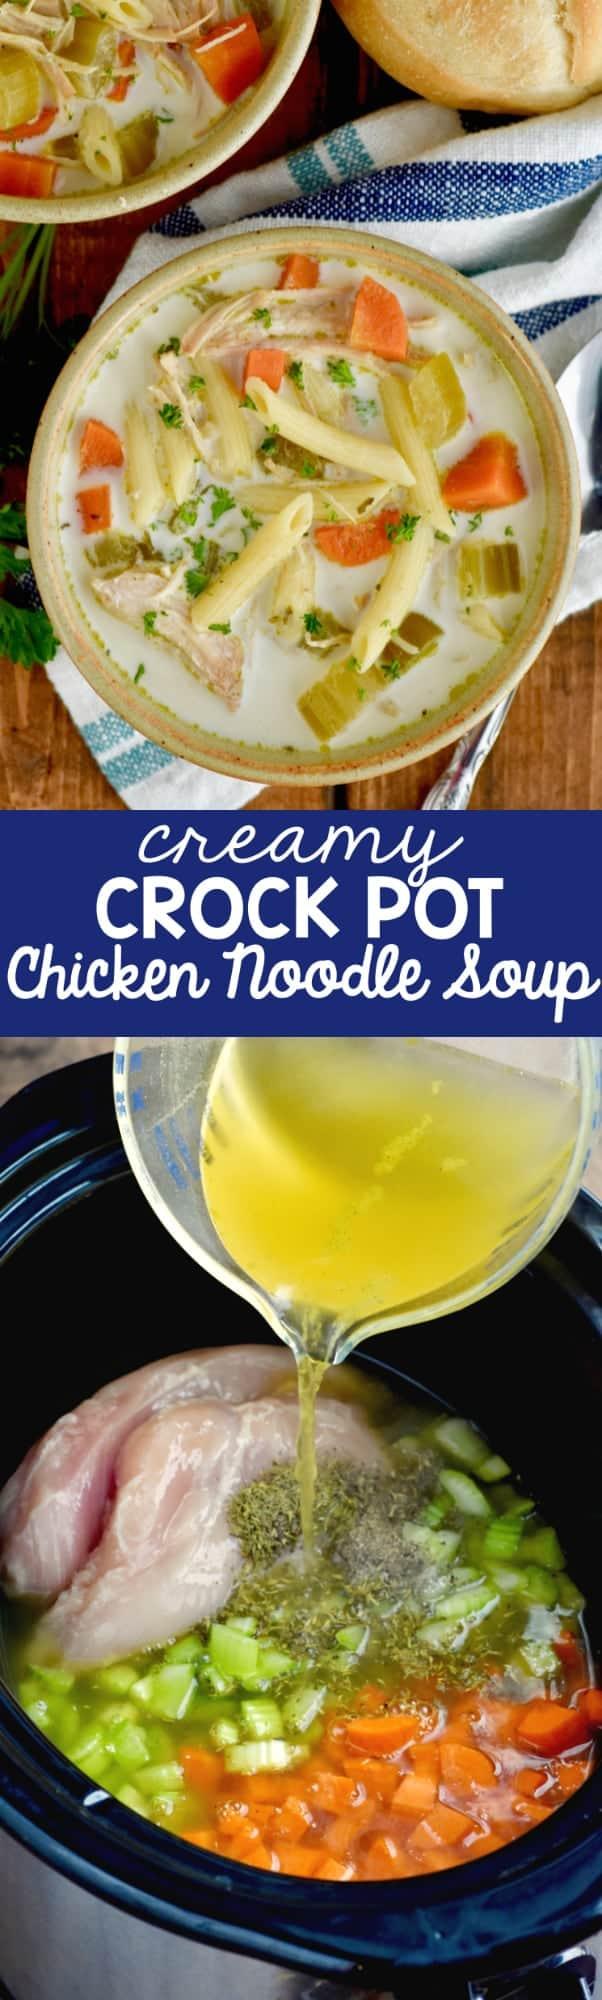 Creamy Crock Pot Chicken Noodle Soup Wine Glue